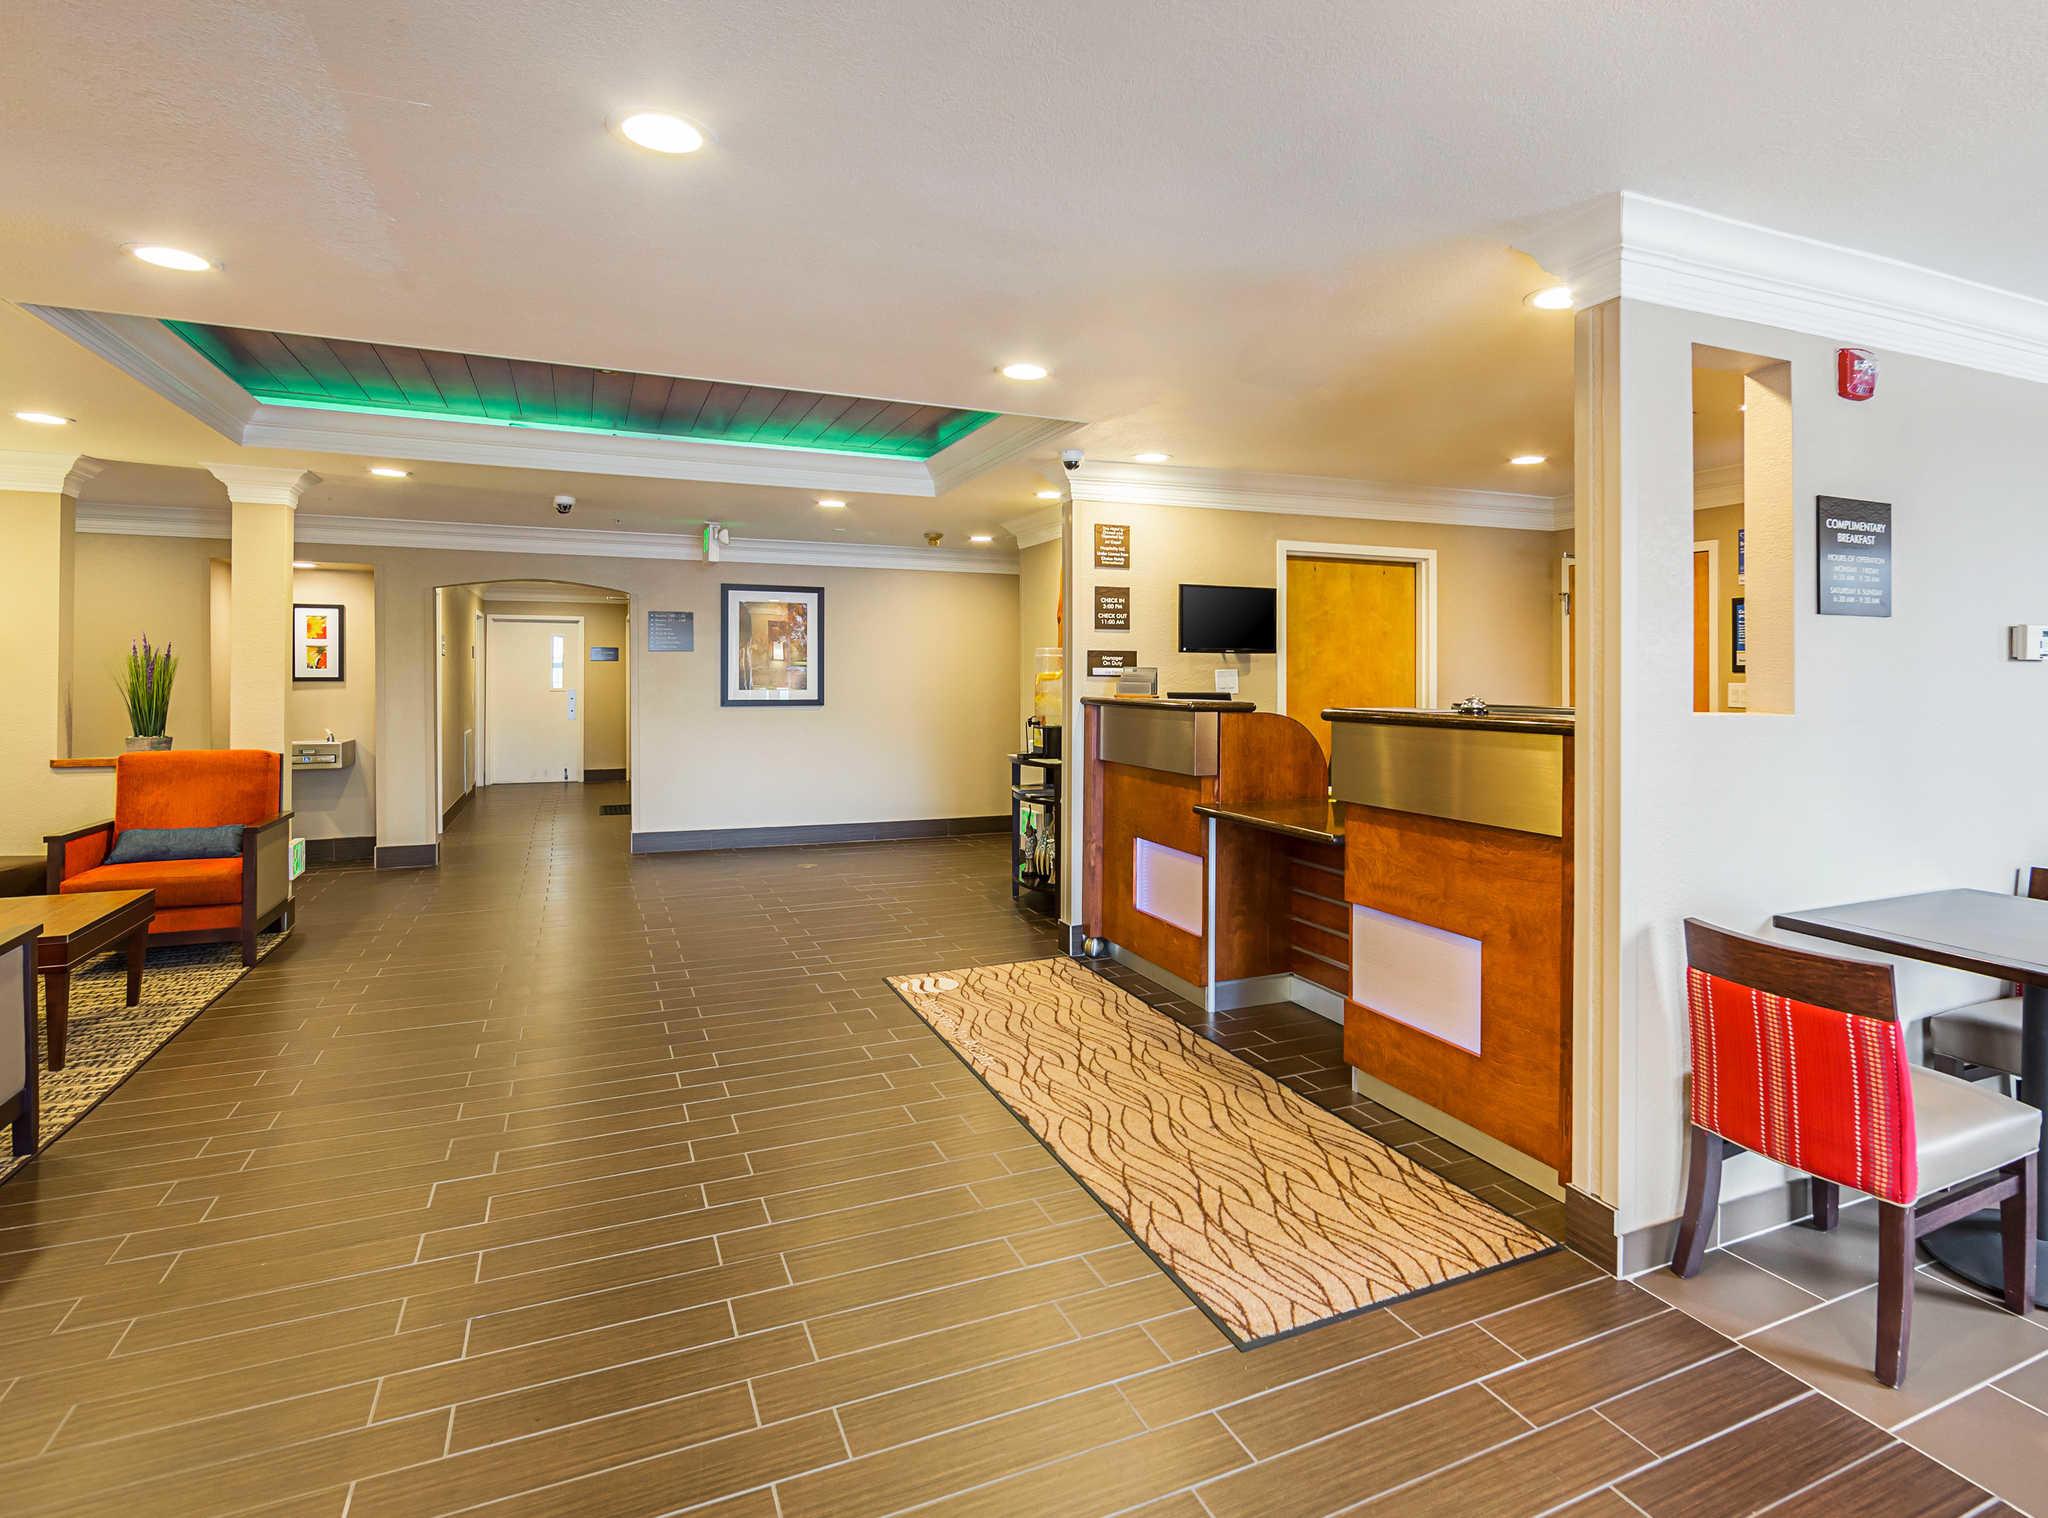 Comfort Inn Arcata Humboldt Area Coupons Near Me In Arcata 8coupons